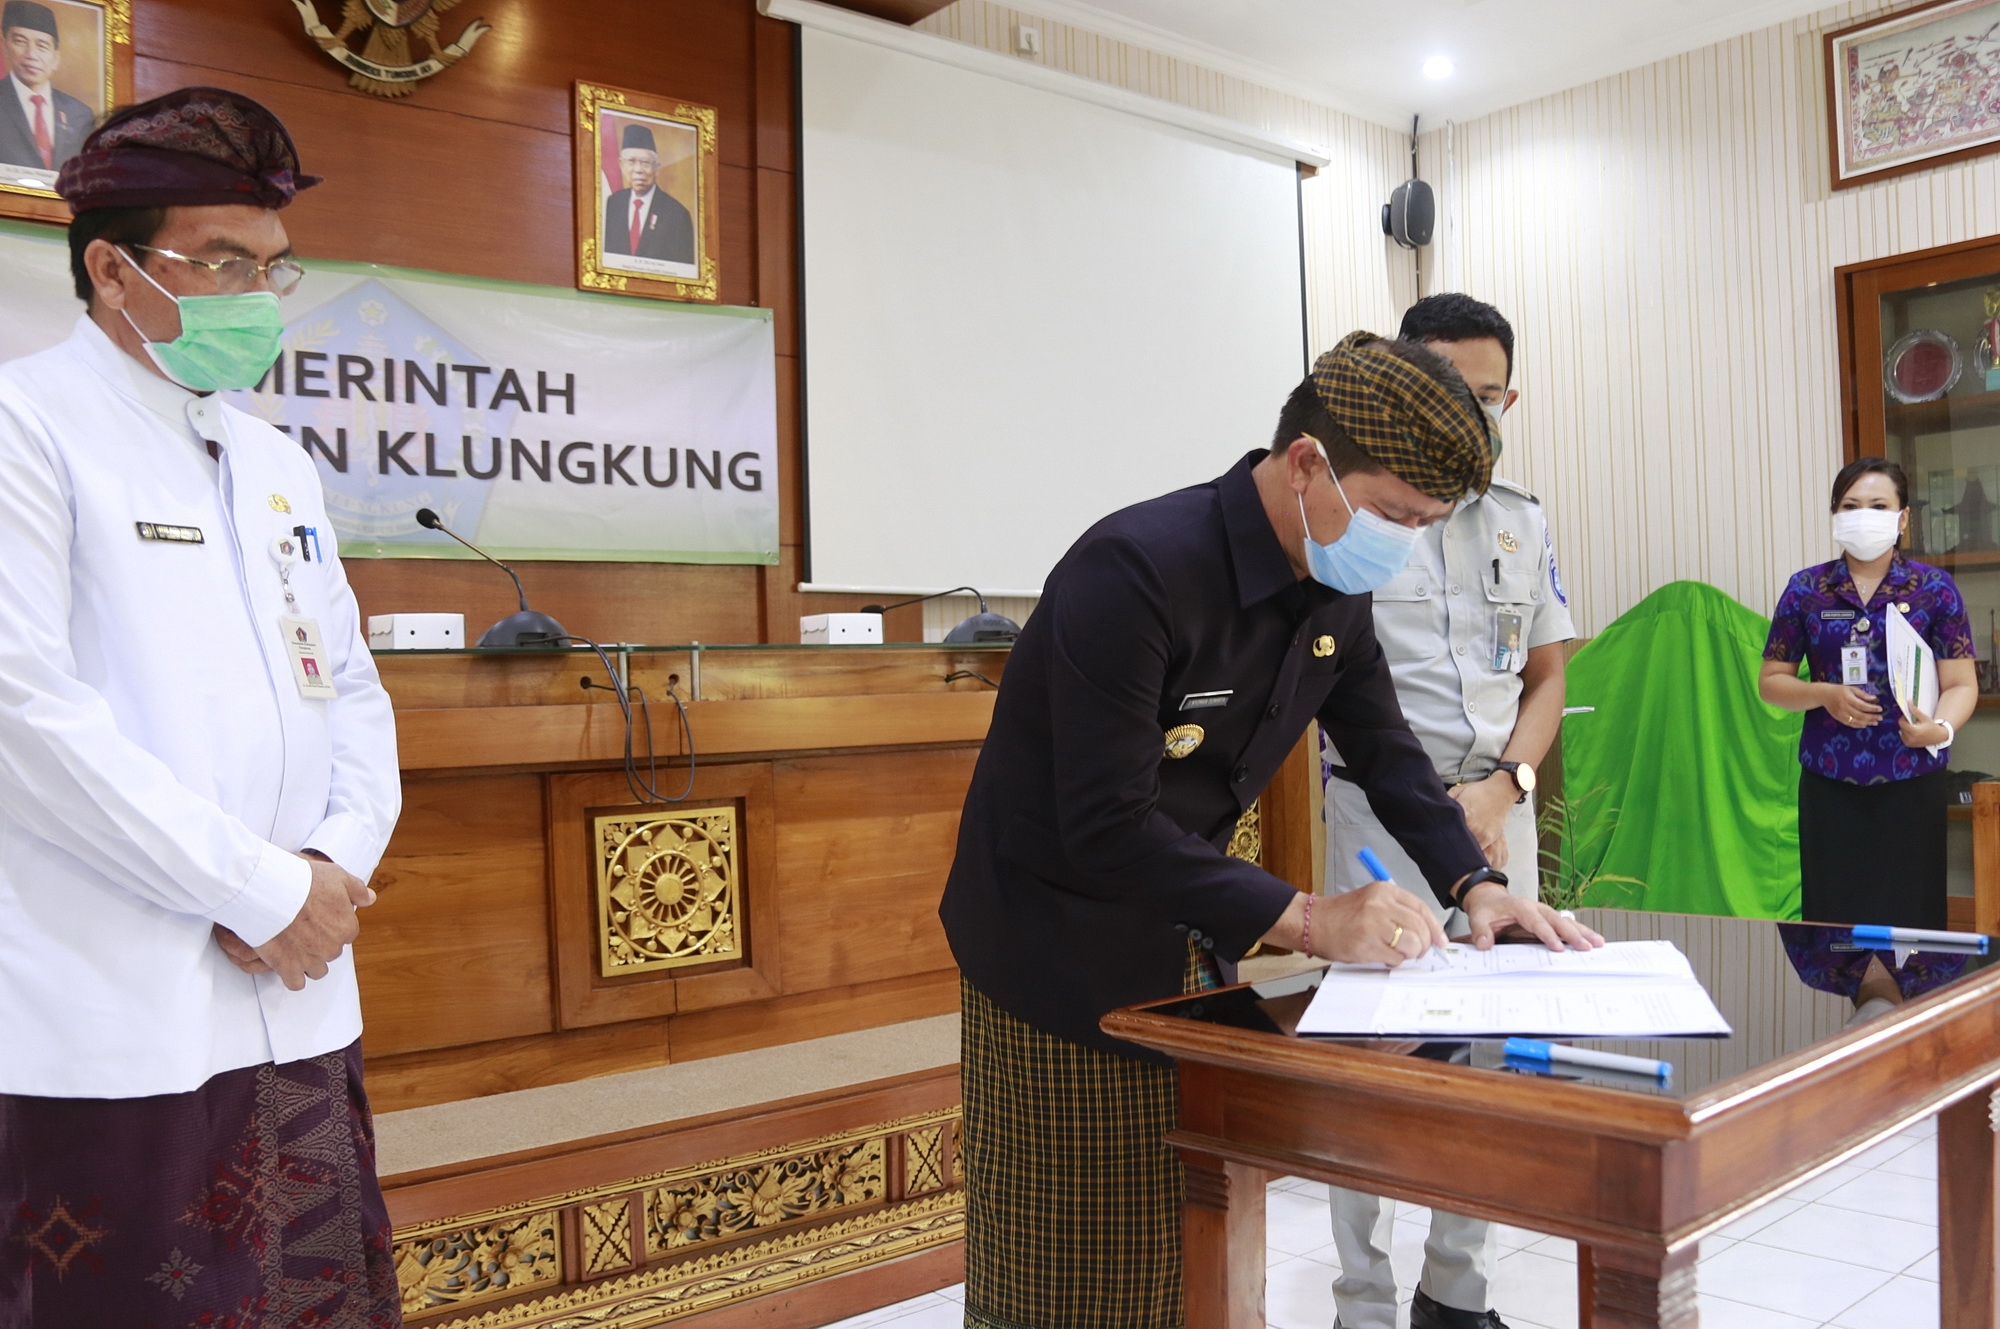 BUPATI Suwirta menandatangani kerjasama dengan PT Jasa Raharja Cabang Bali, Selasa (6/10/2020) di ruang rapat Praja Mandala Kantor Bupati Klungkung.